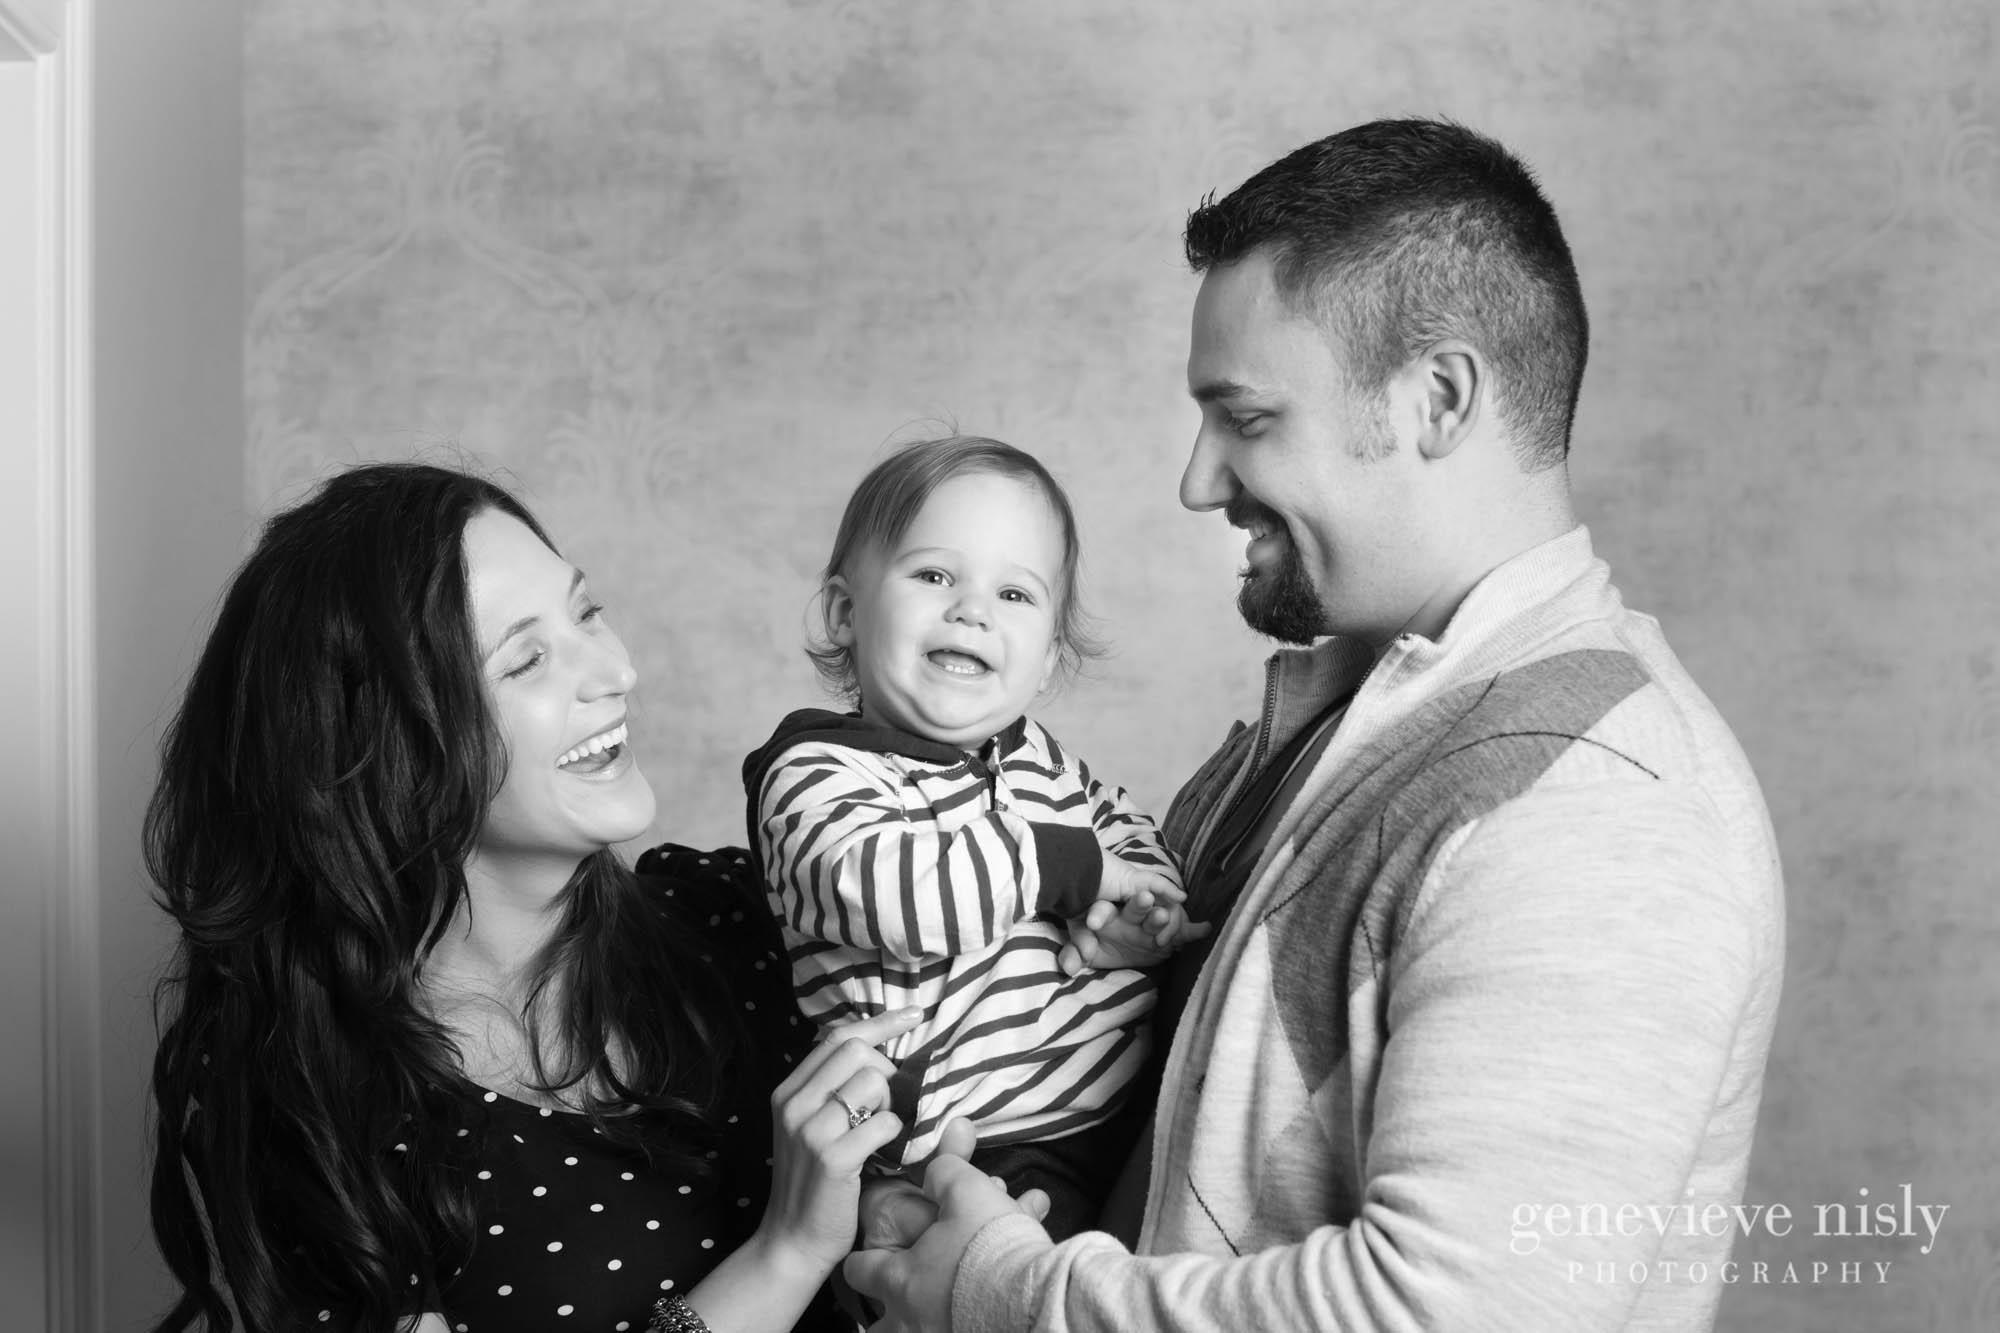 Copyright Genevieve Nisly Photography, Family, Green, Ohio, Portraits